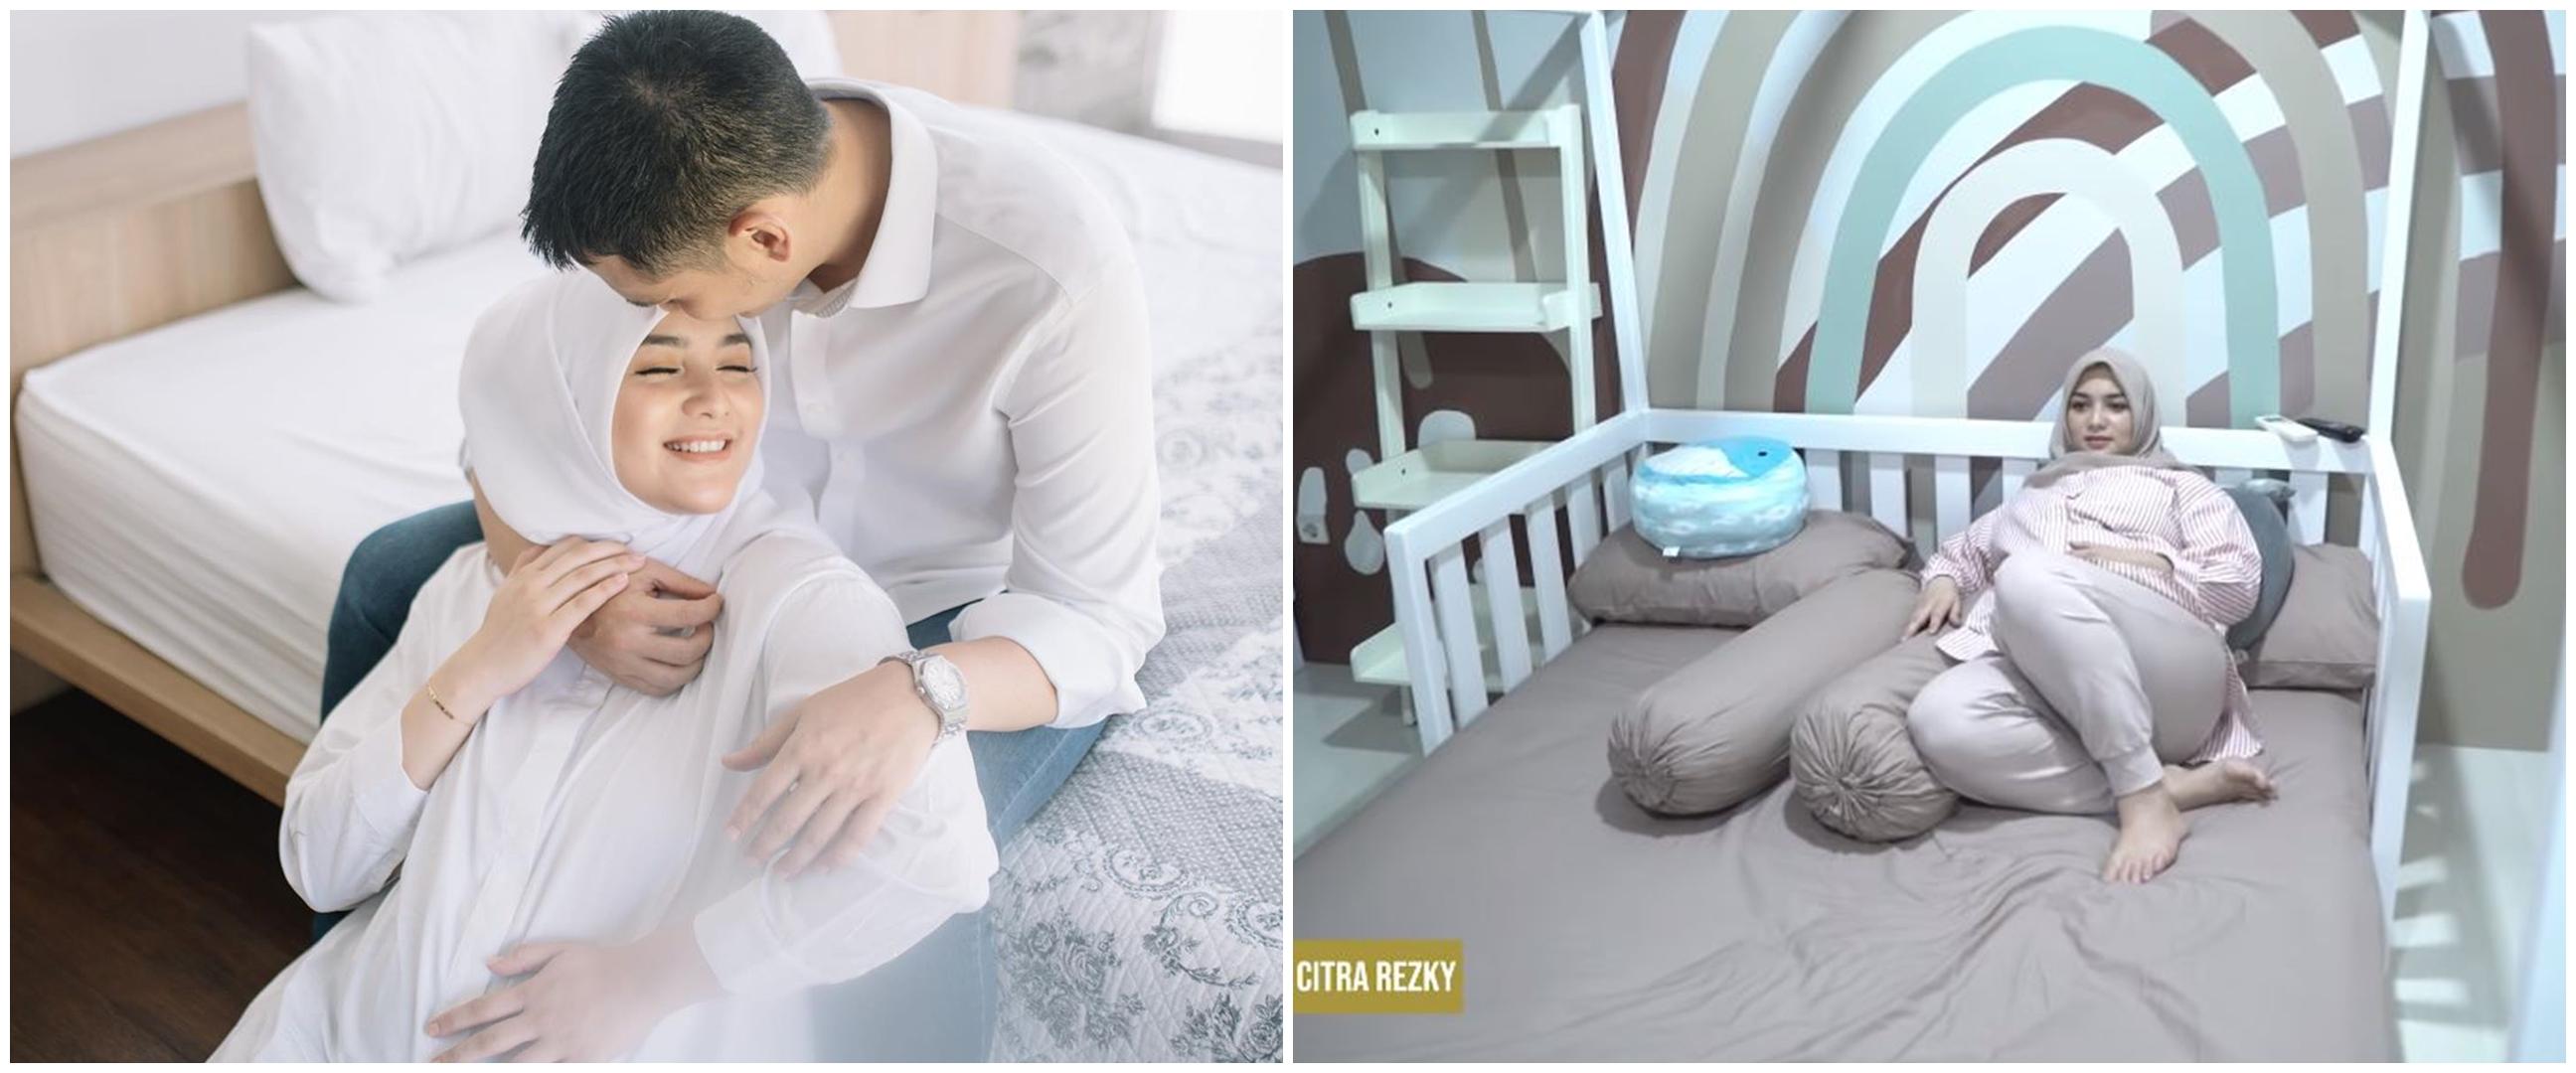 Satu hari jelang lahiran, intip 8 potret kamar bayi Citra Kirana